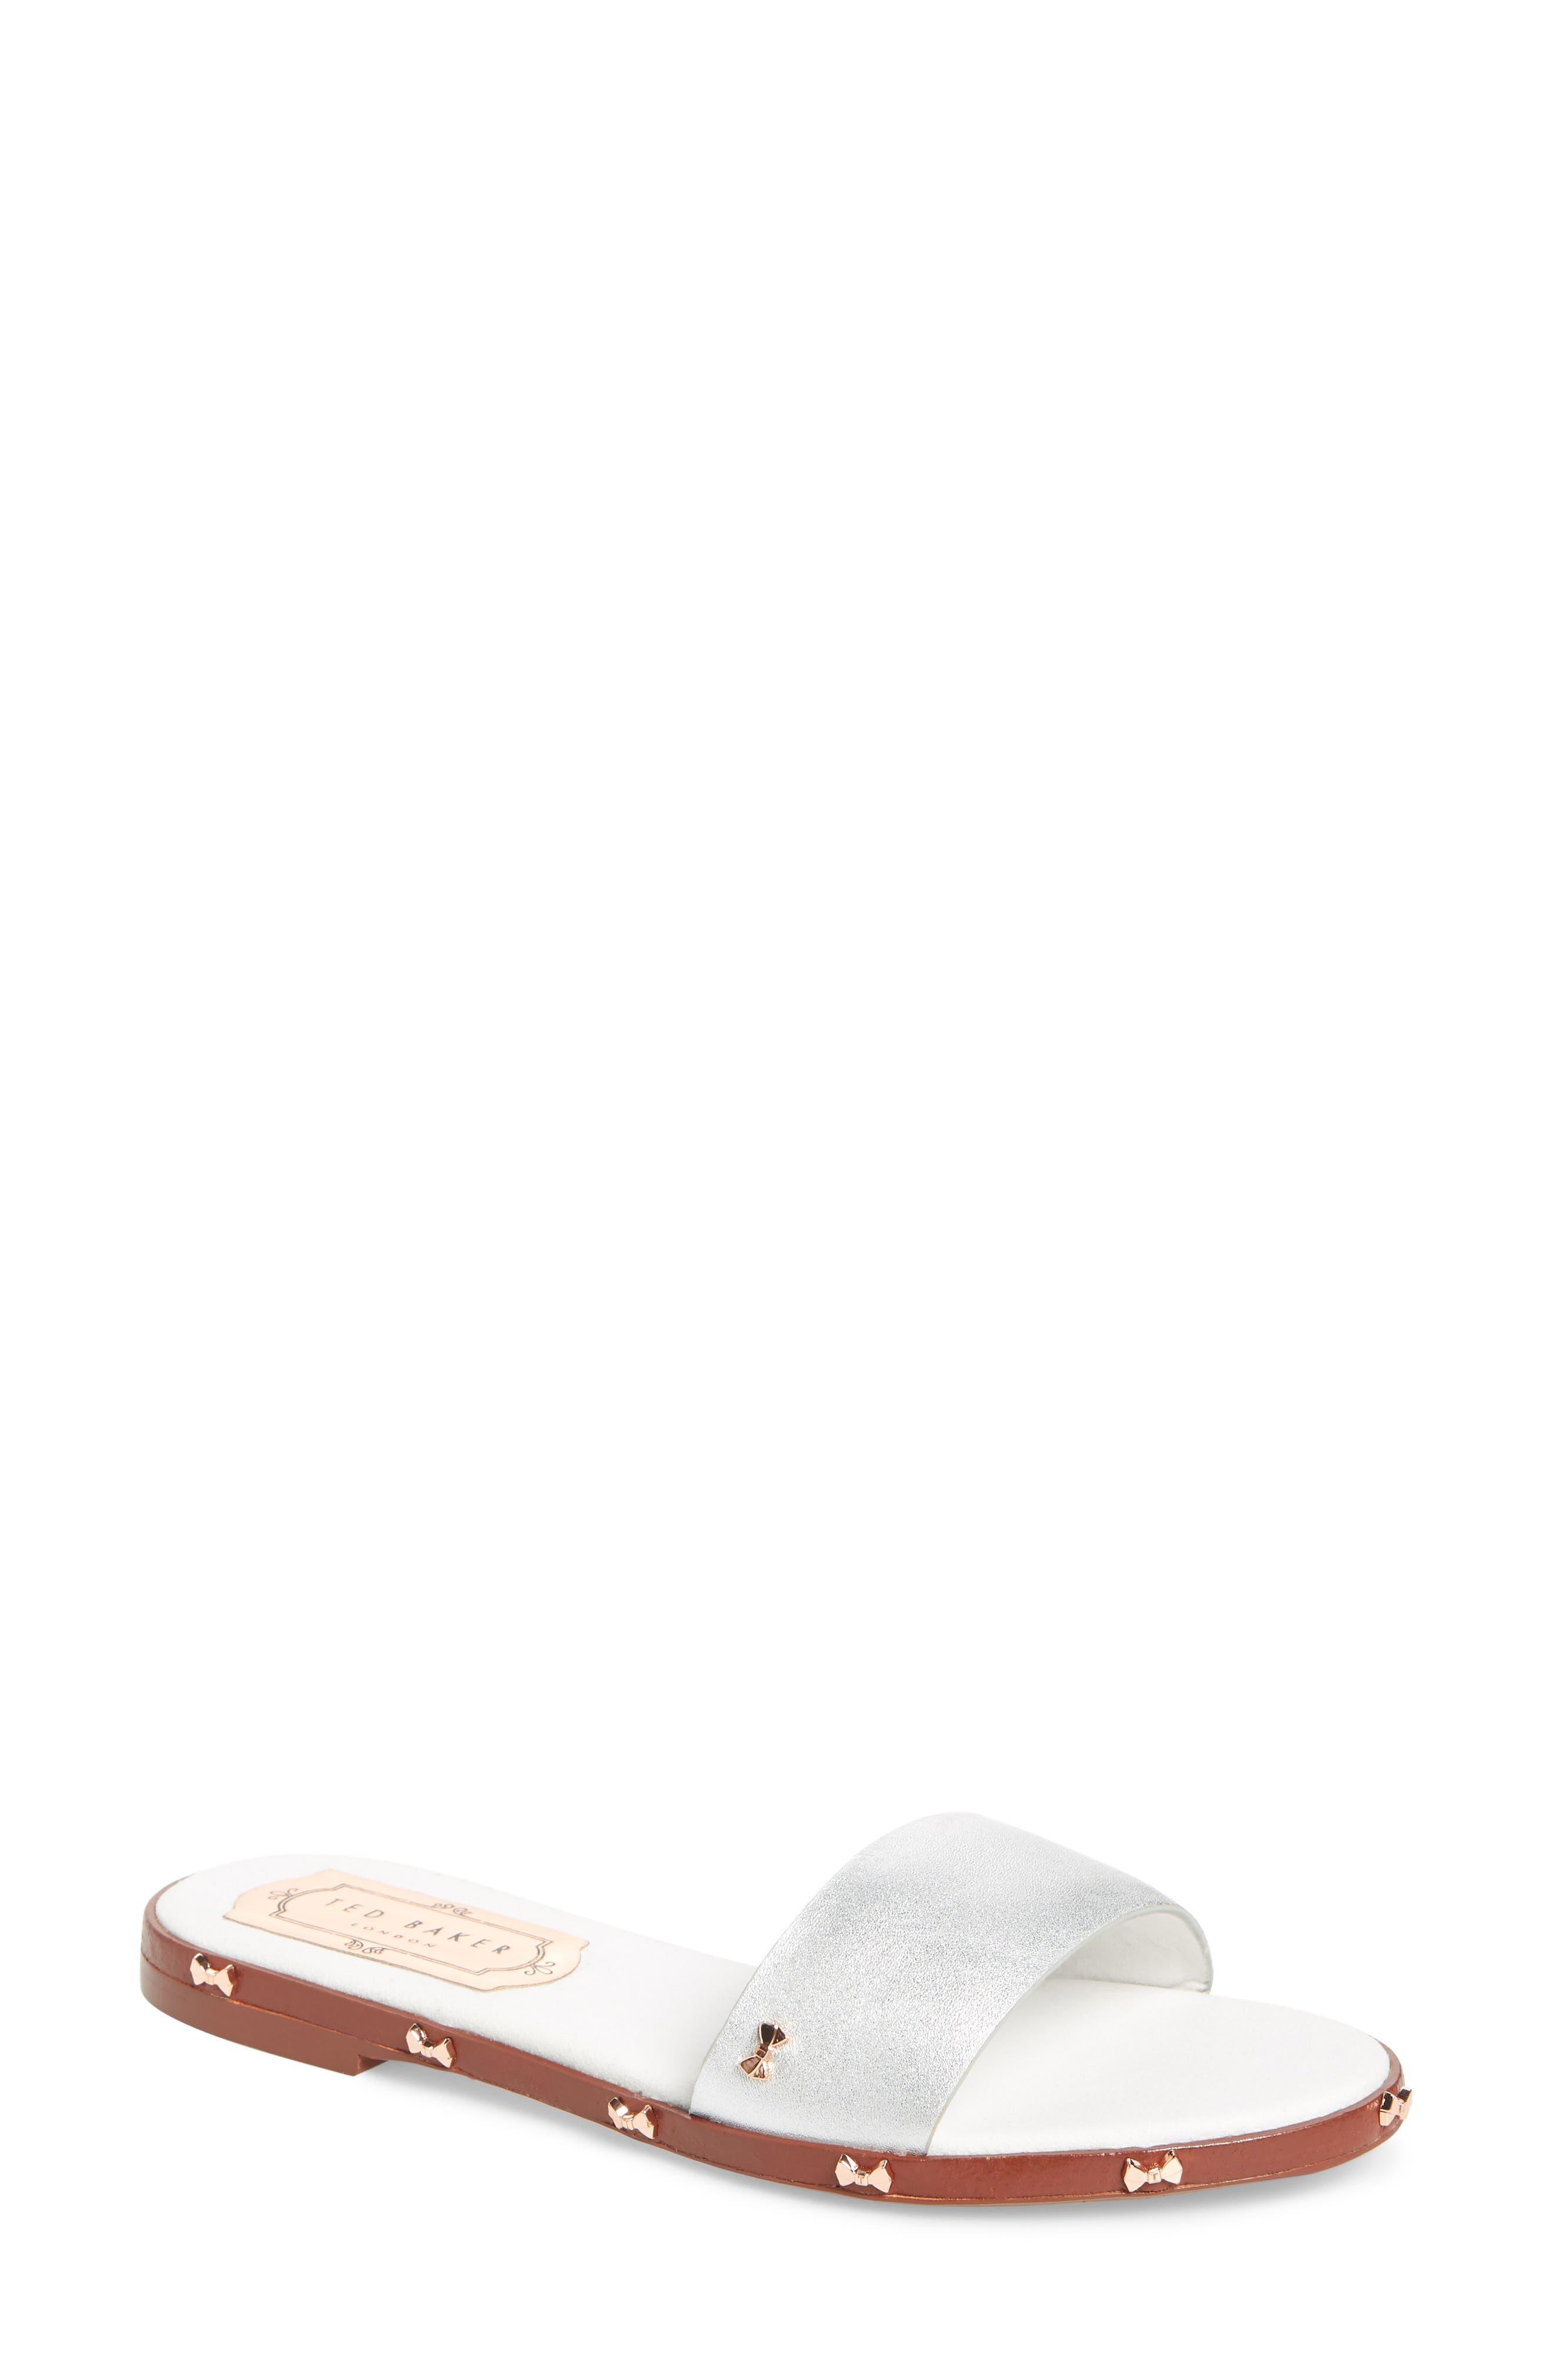 Kytti Slide Sandal,                         Main,                         color, Silver Leather